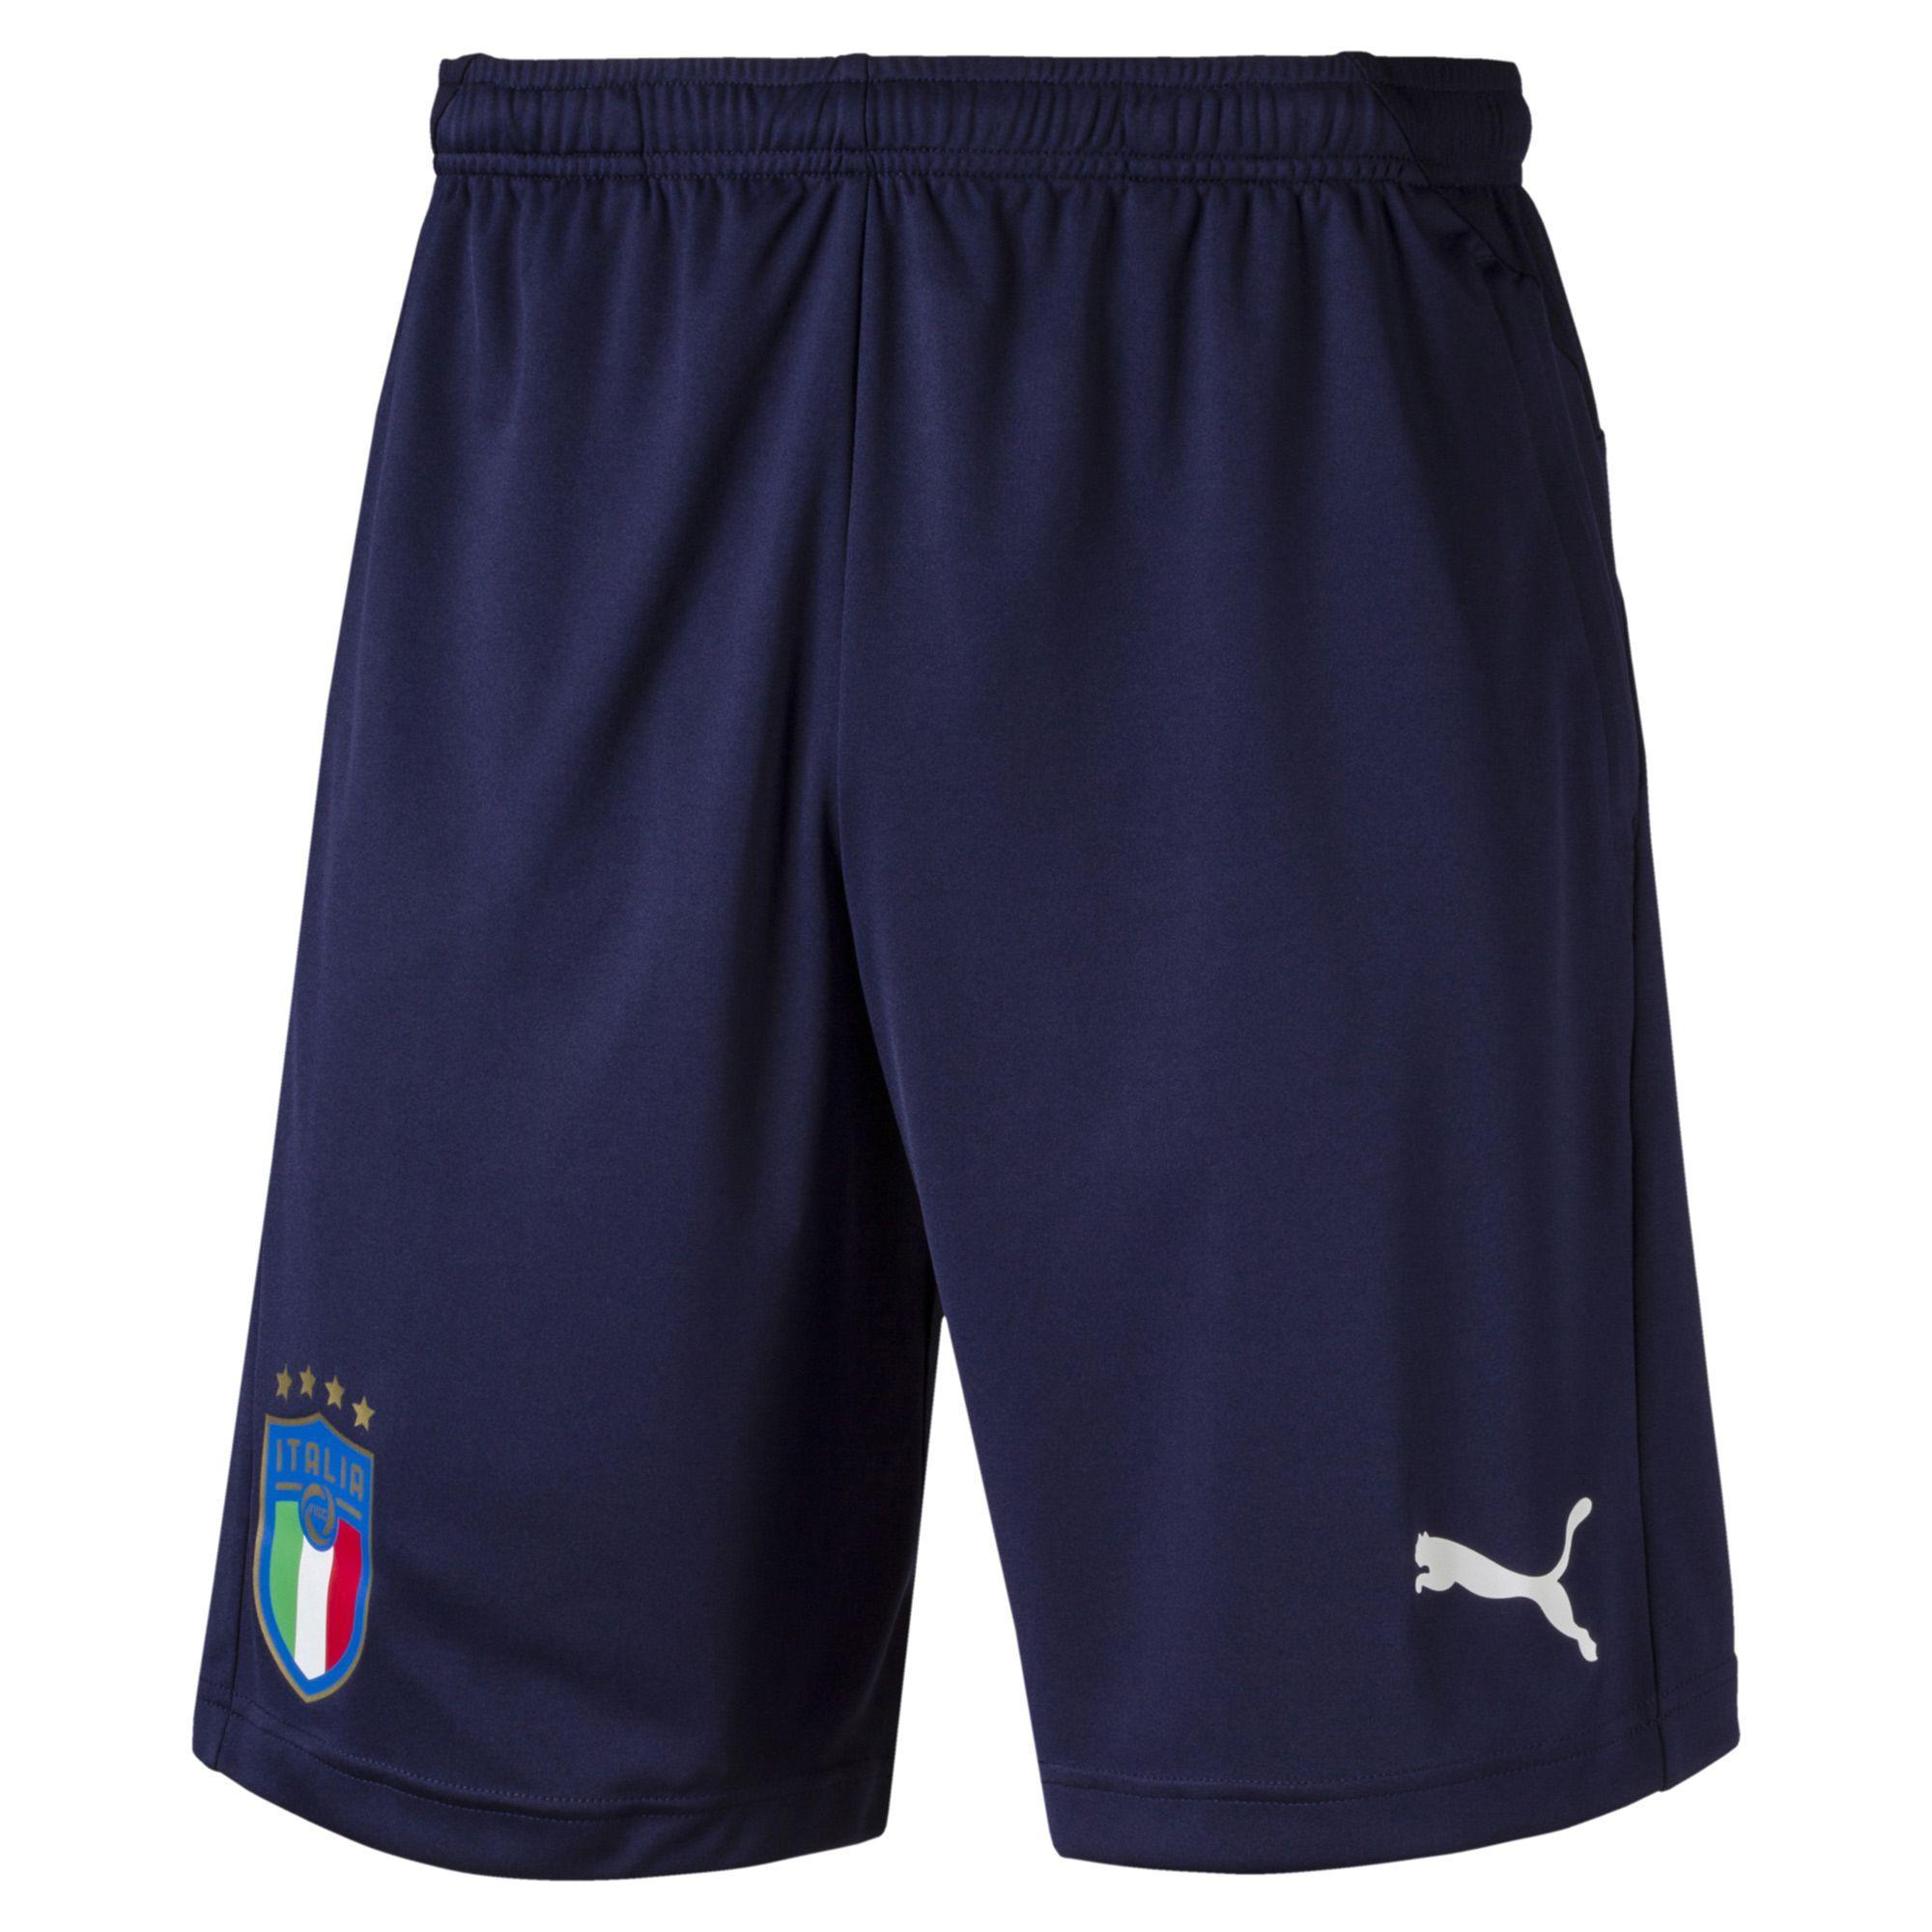 b2b413cede23 Puma Short Pants Figc Training Shorts Italy Peacoat-team Power Blue ...